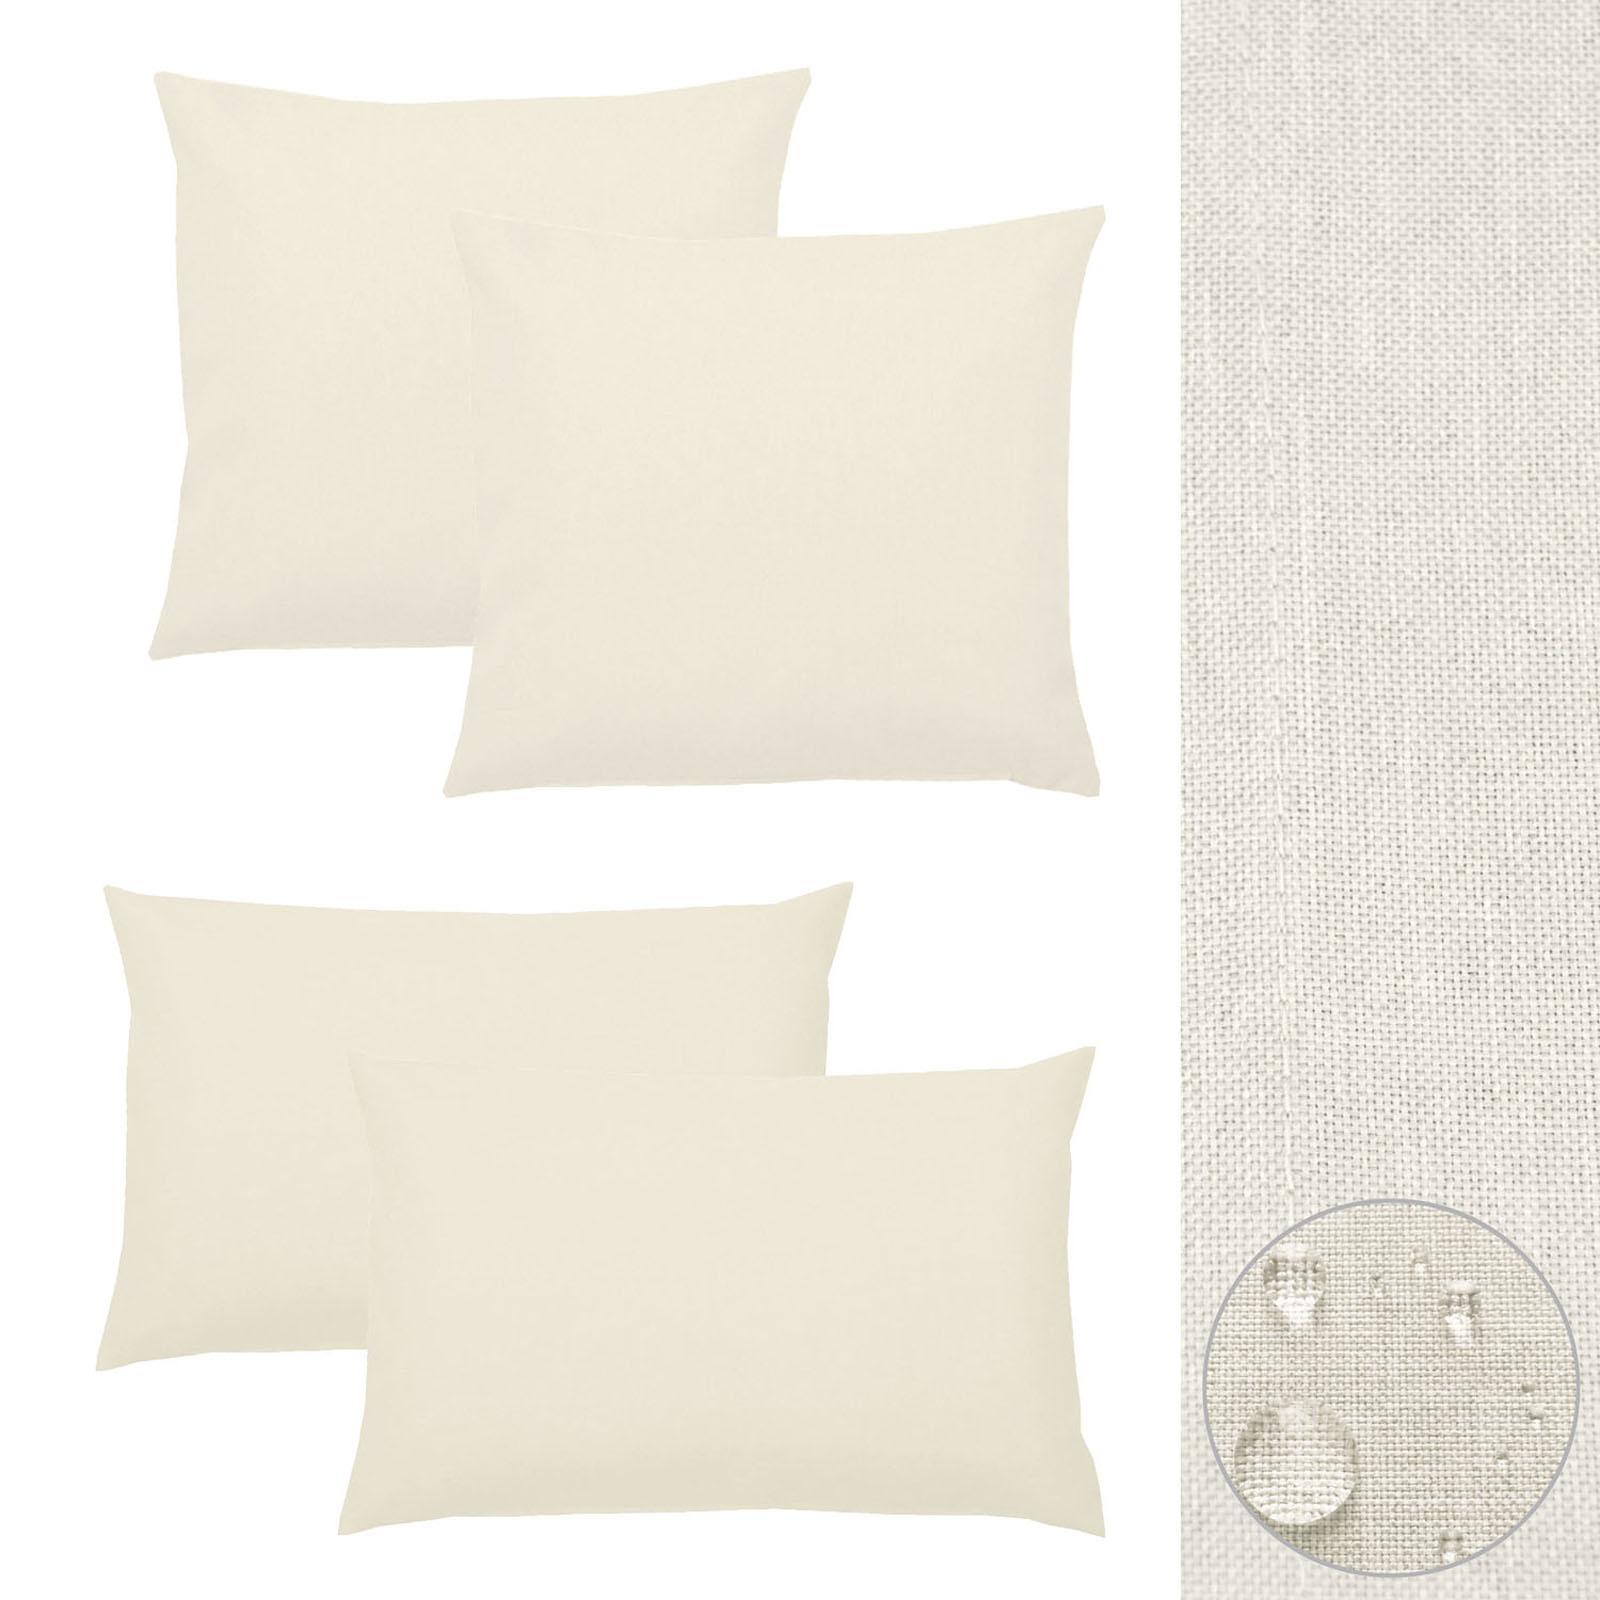 sofa kissenbezge stunning kissenbezug kissenhlle x cm. Black Bedroom Furniture Sets. Home Design Ideas